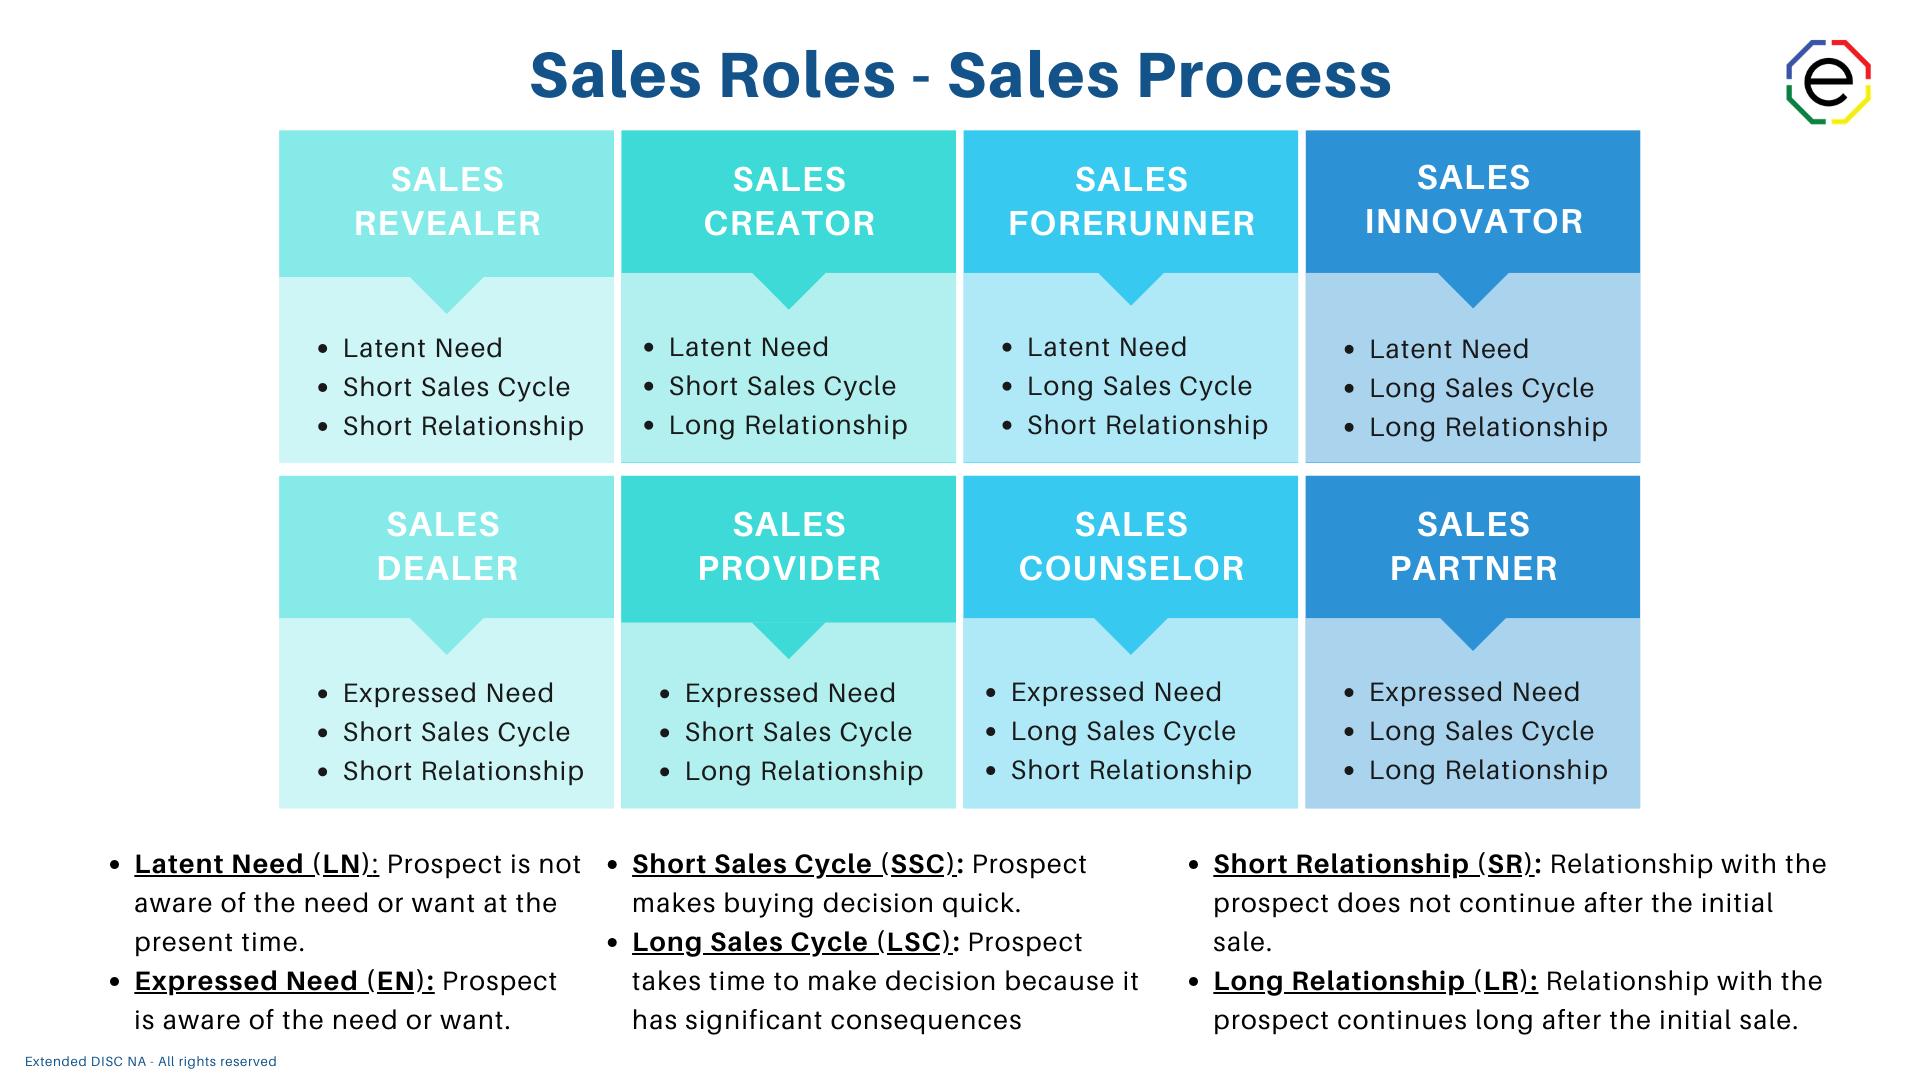 Sales Roles Sales Process